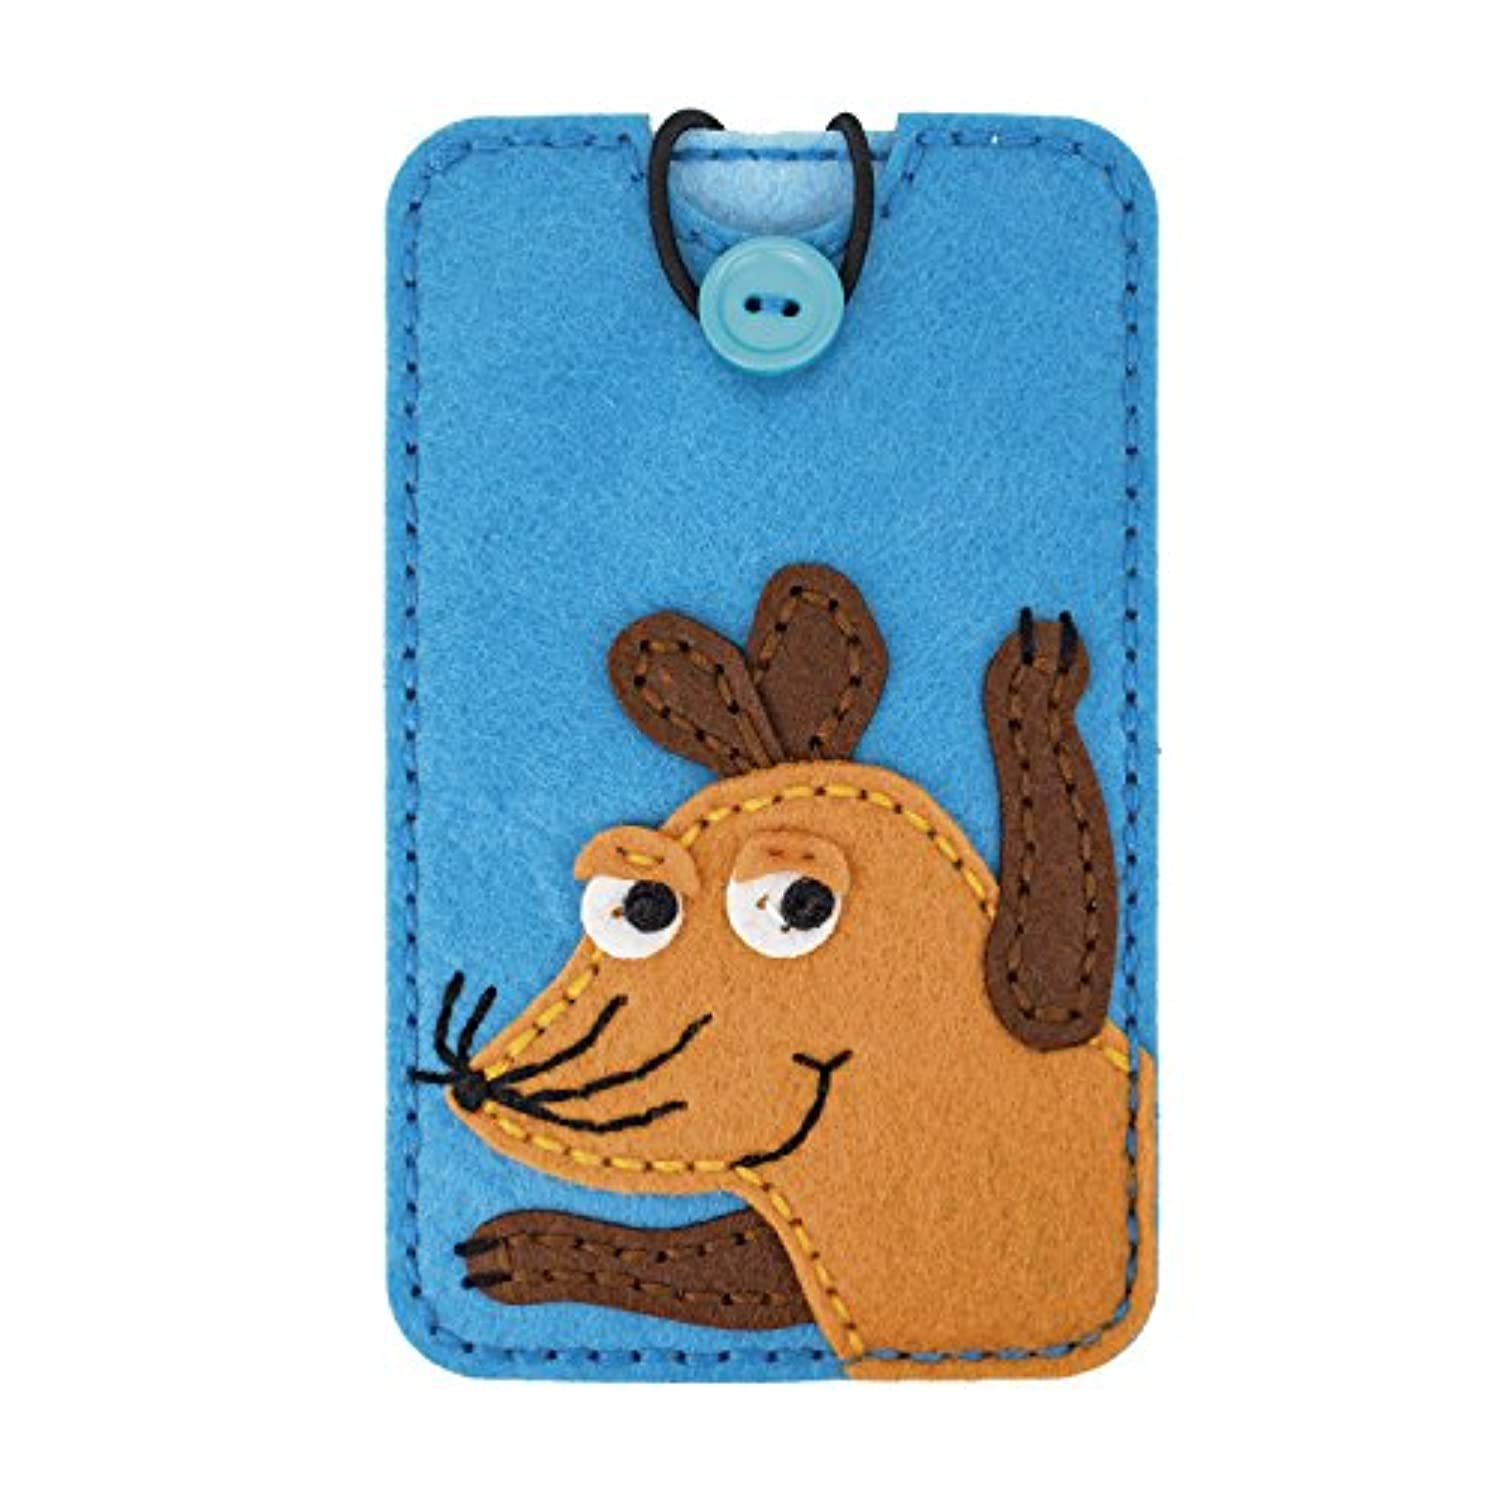 Wenco Felt Craft Kit Smartphone Case Rubber Sendung mit der Maus, Polyester, Acrylic, Blue, 1.5?x 10?x 20?cm